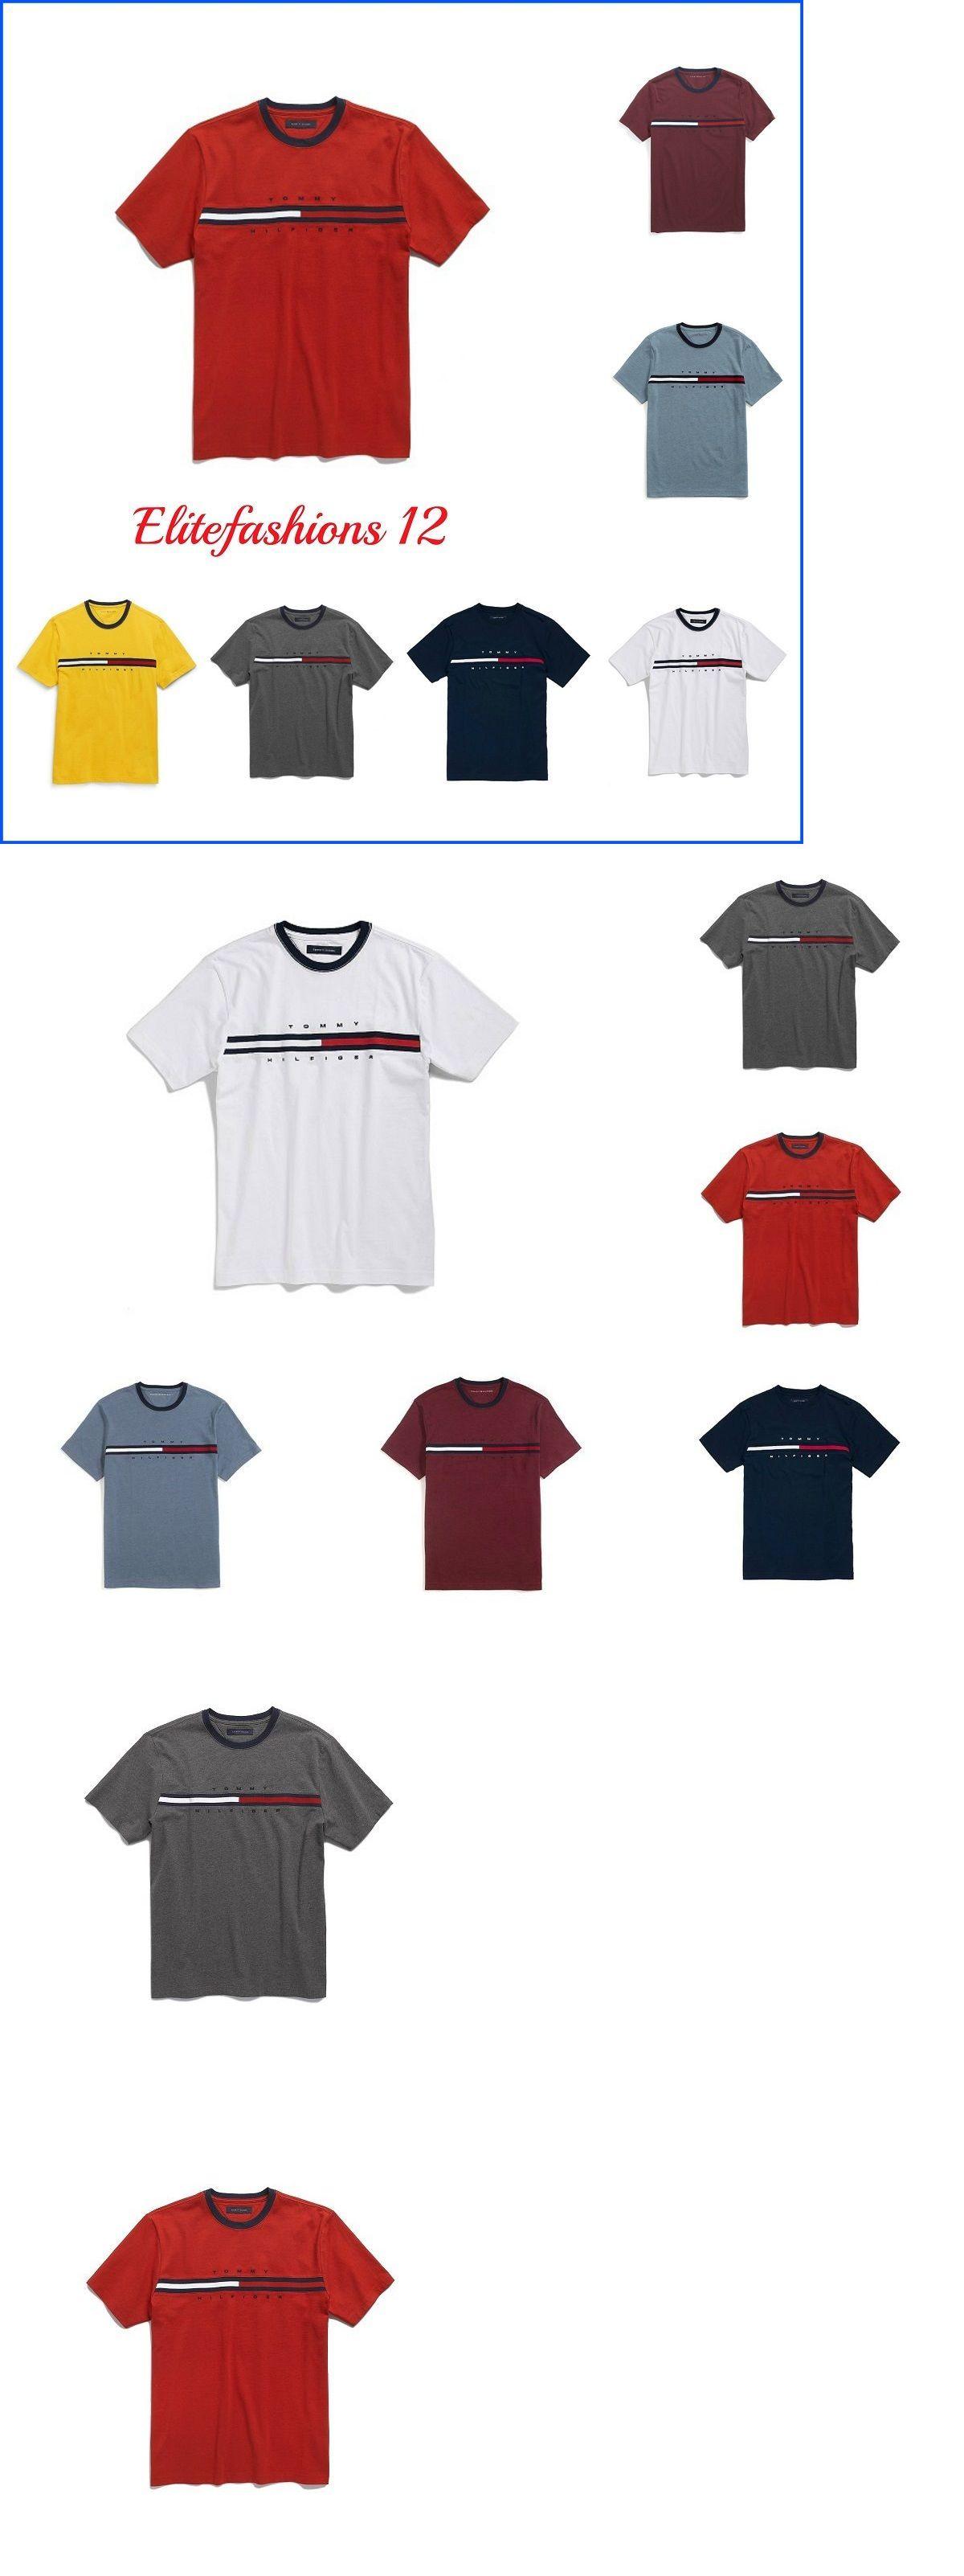 c89efc4eb T-Shirts 15687: Tommy Hilfiger Mens Signature Logo Crew Neck T Shirt,Xs, S,M,L,Xl,2Xl -> BUY IT NOW ONLY: $30.99 on eBay!